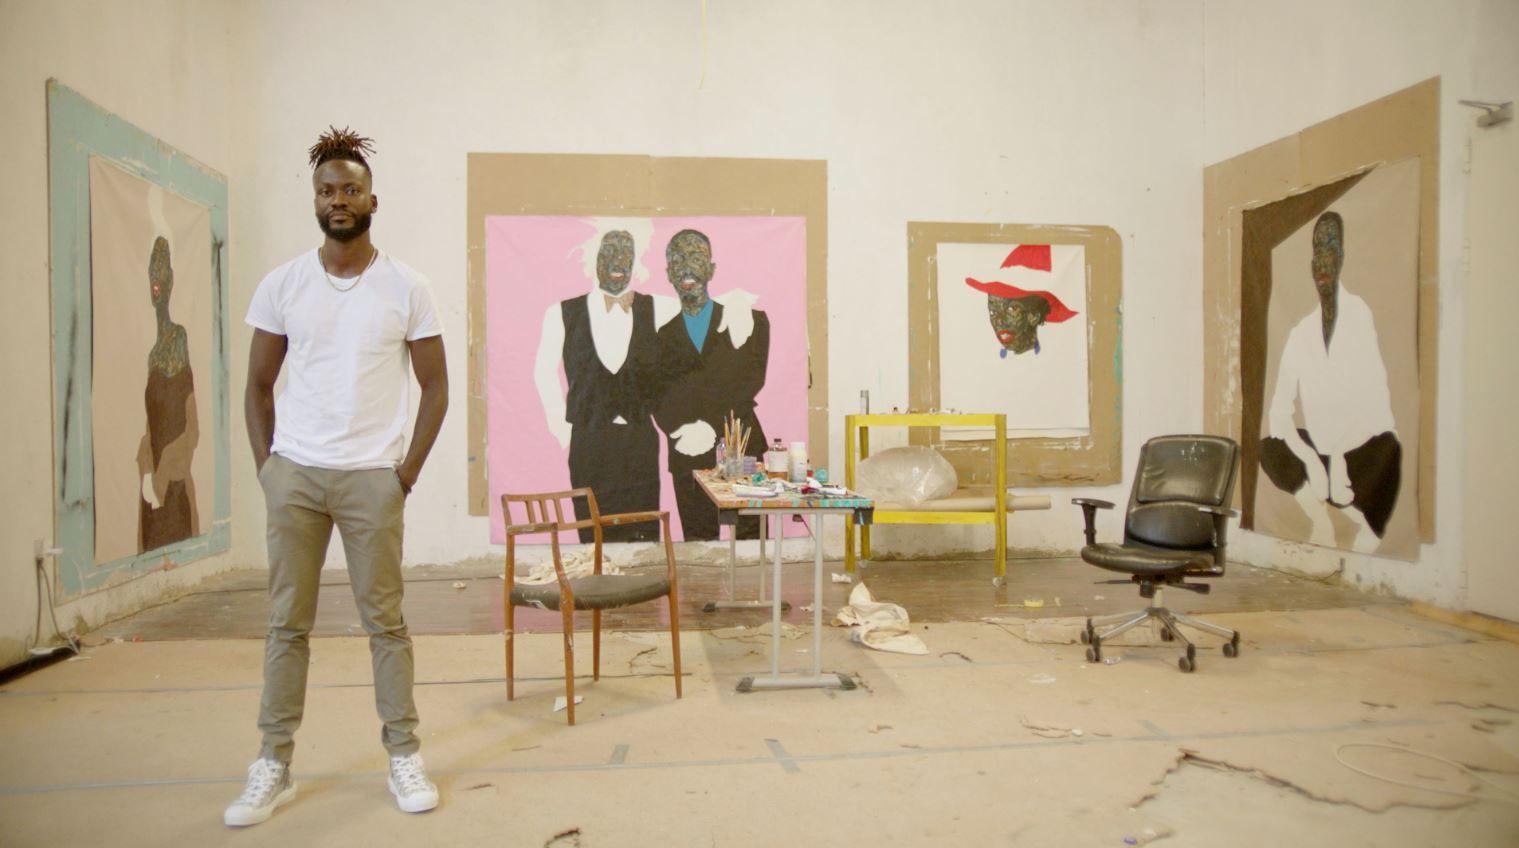 【DIOR】サマー 2021 メンズ コレクションを発表:アーティストの肖像画